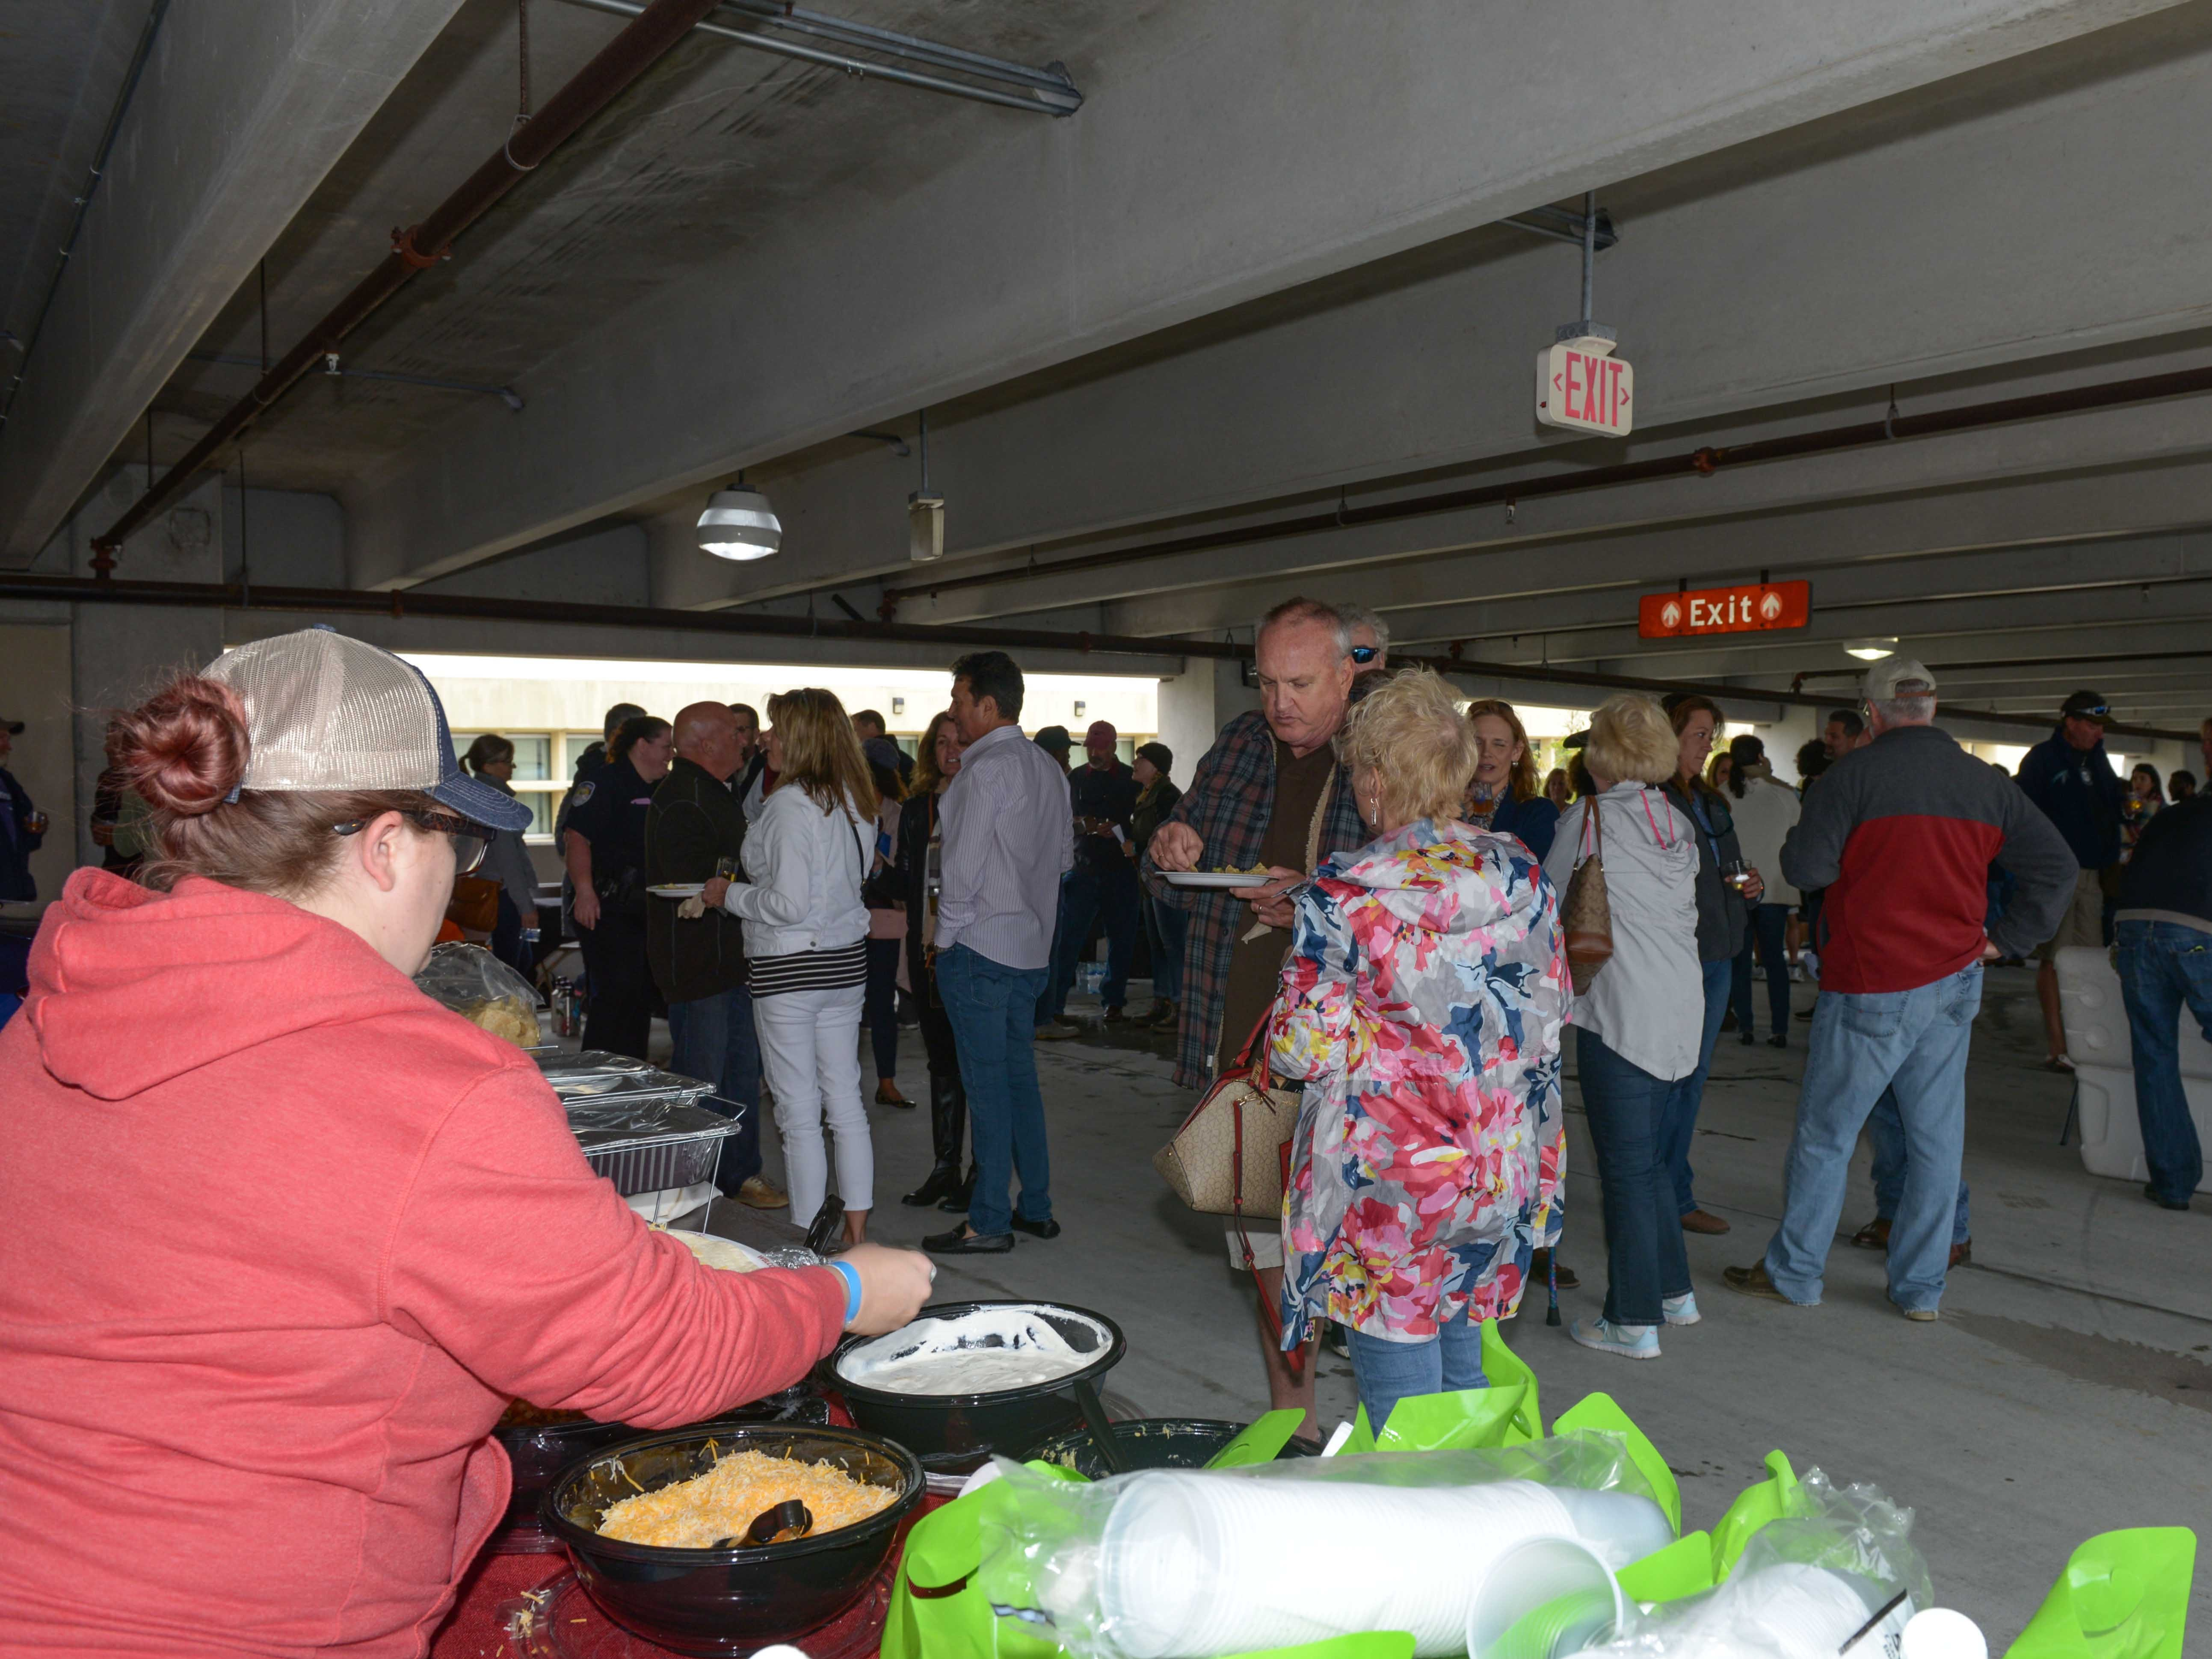 Bluebird Educational Foundation's Groovin' & Tastin' Sunrise City Wine & Spirits Fest moved inside of the Fort Pierce City Parking Garage once the rain started on Feb. 2.